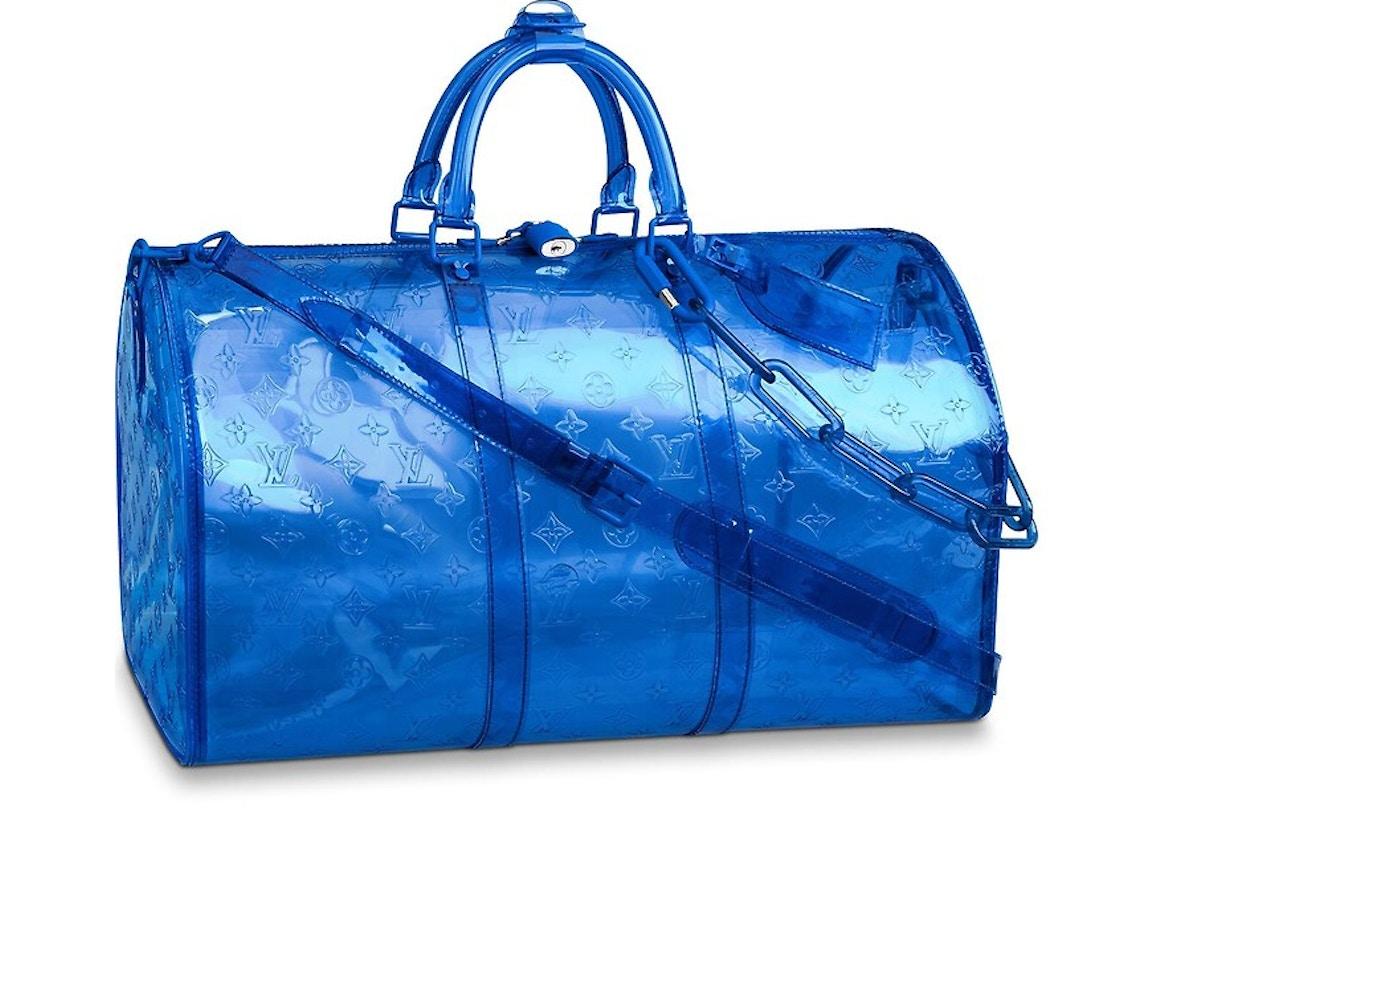 dd98536b1206 Louis Vuitton Keepall Monogram Bandouliere 50 Blue. Monogram Bandouliere 50  Blue